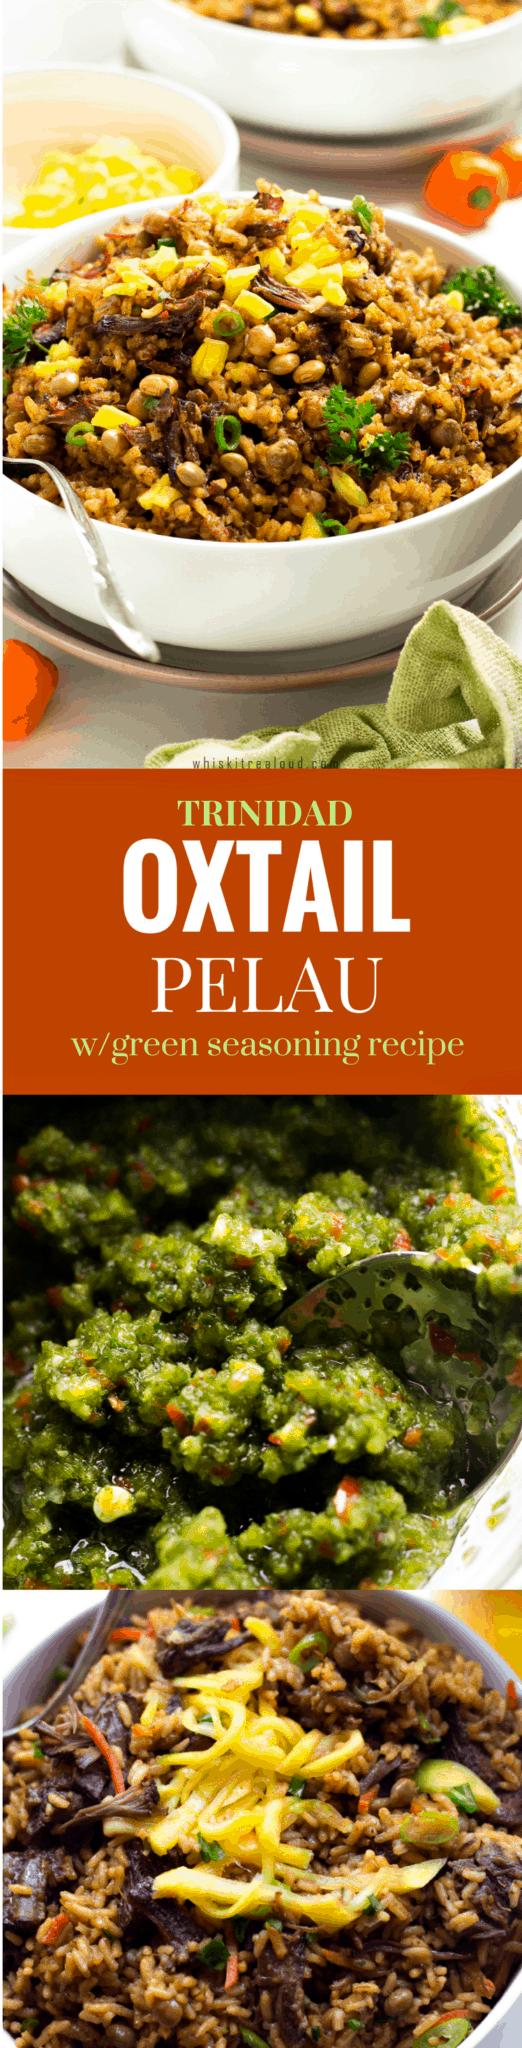 Trinidad Oxtail Pelau